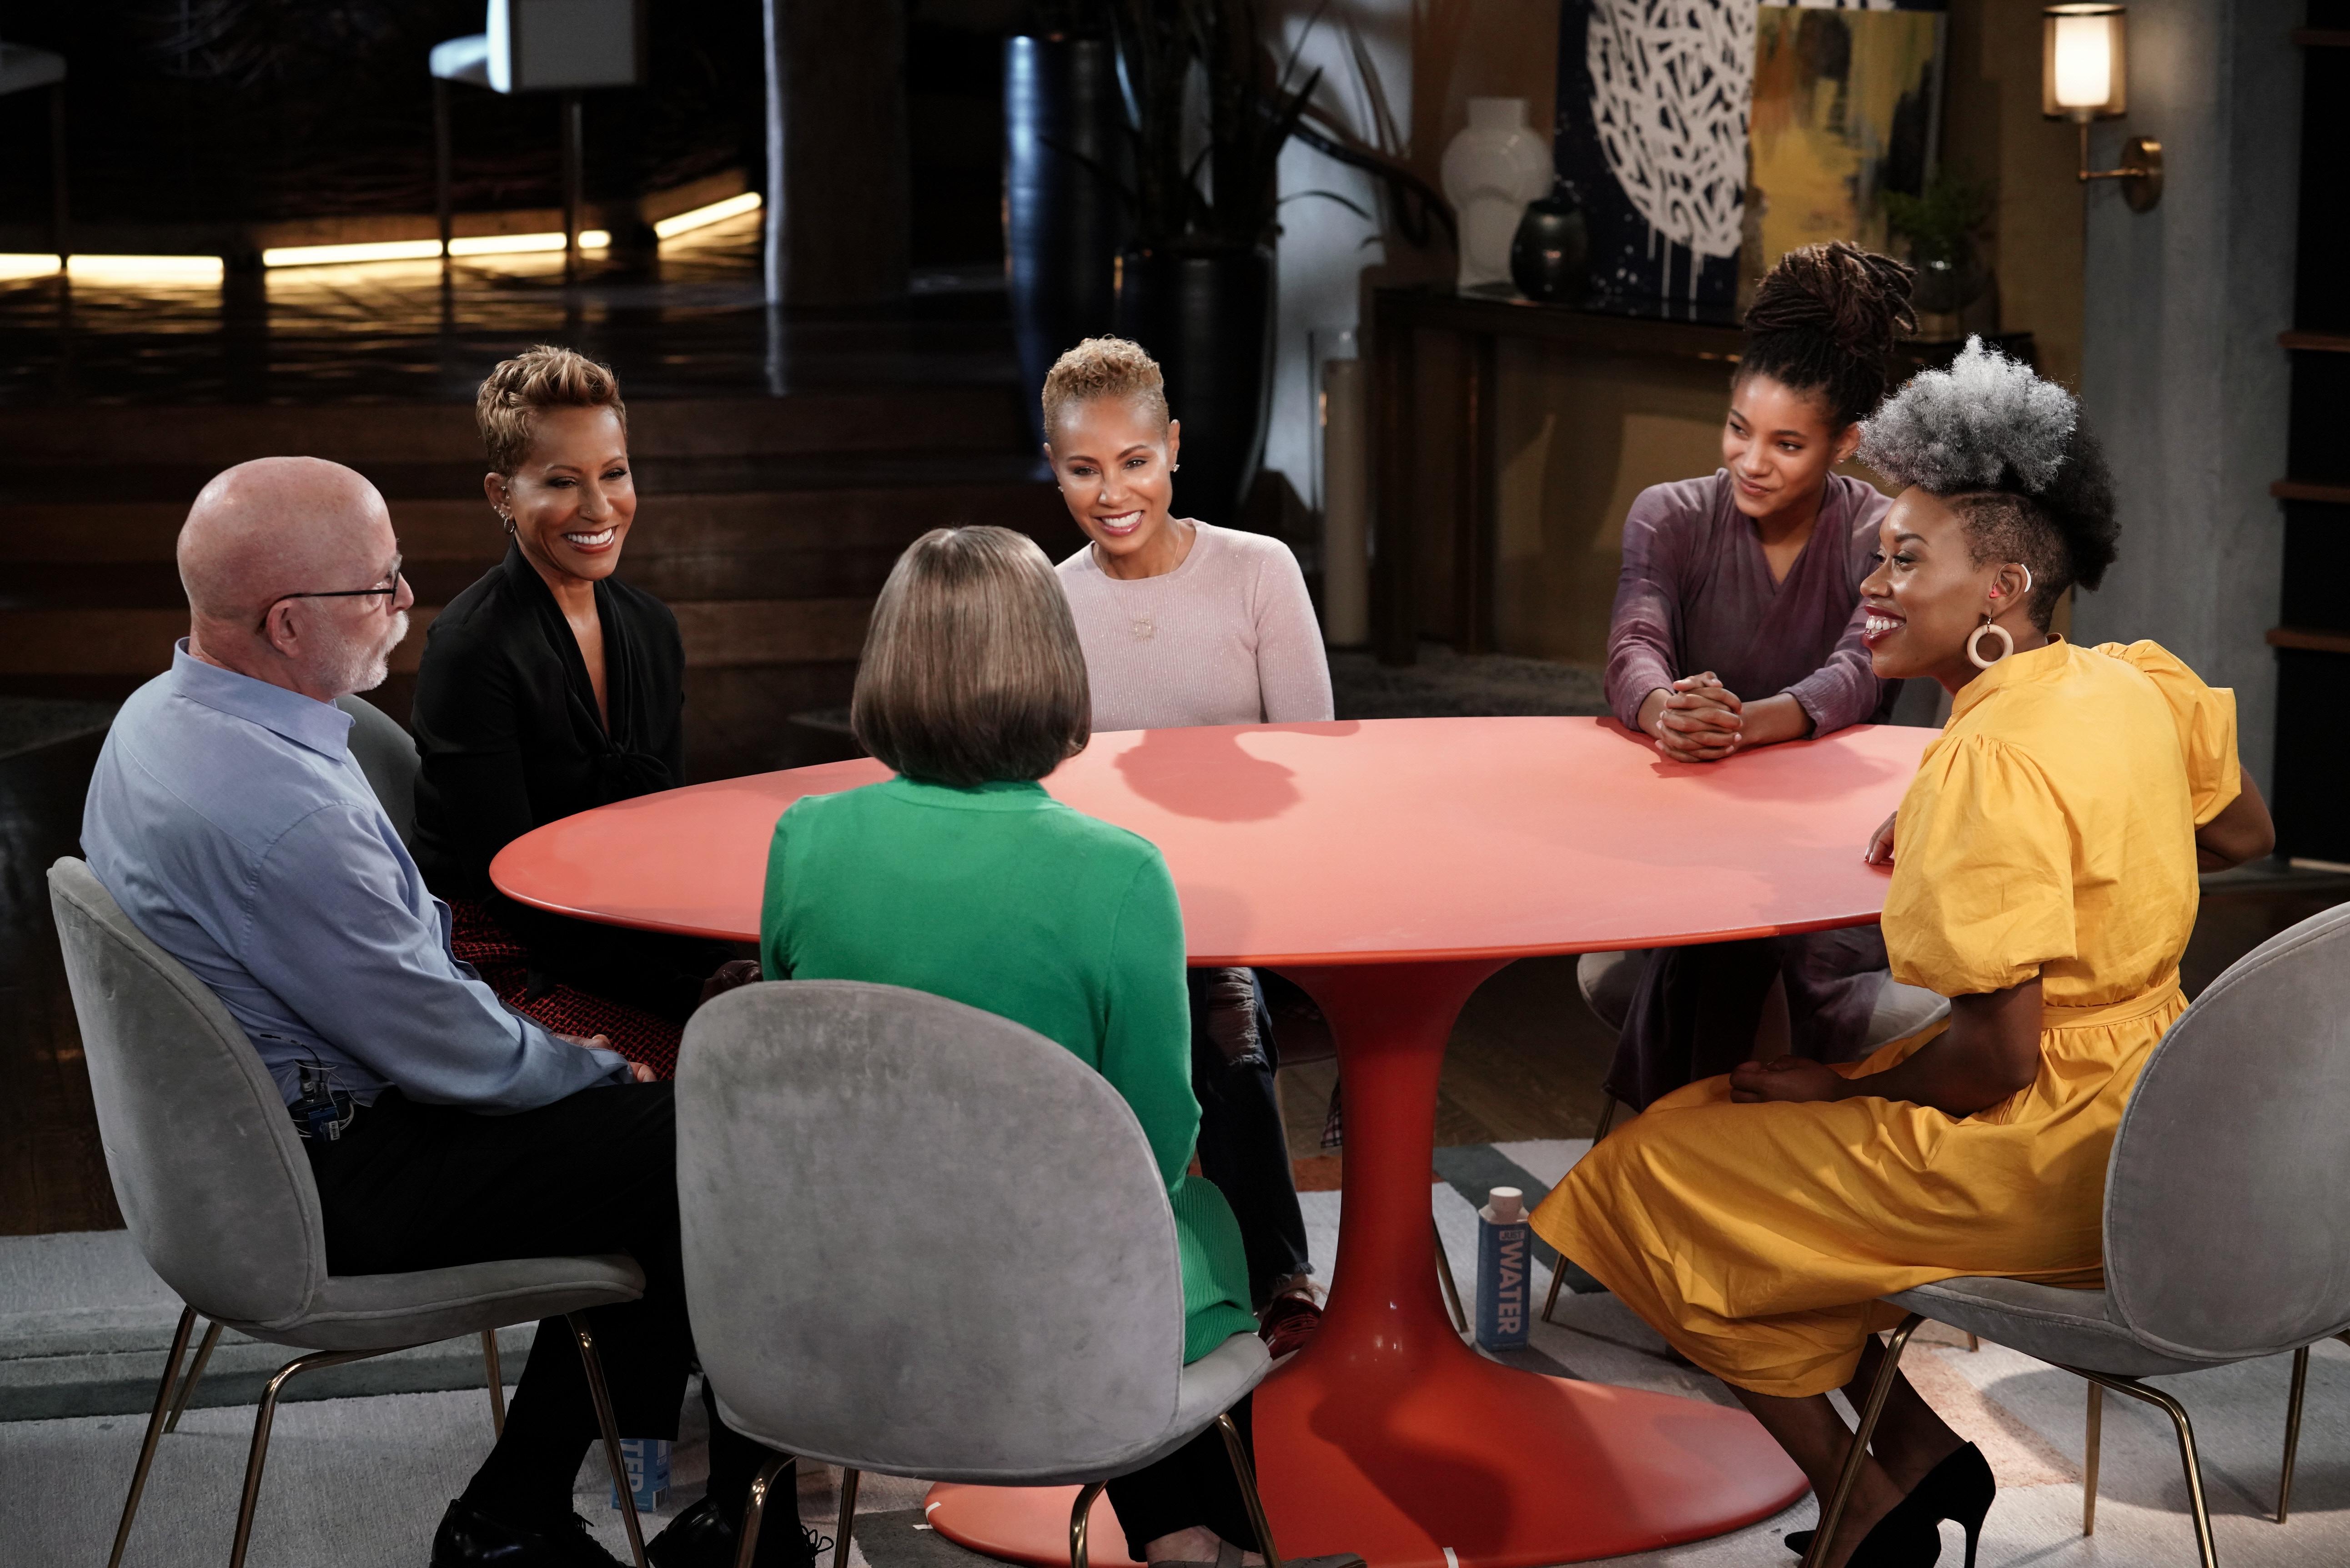 Angela Tucker Transracial Adoption Red Table Talk